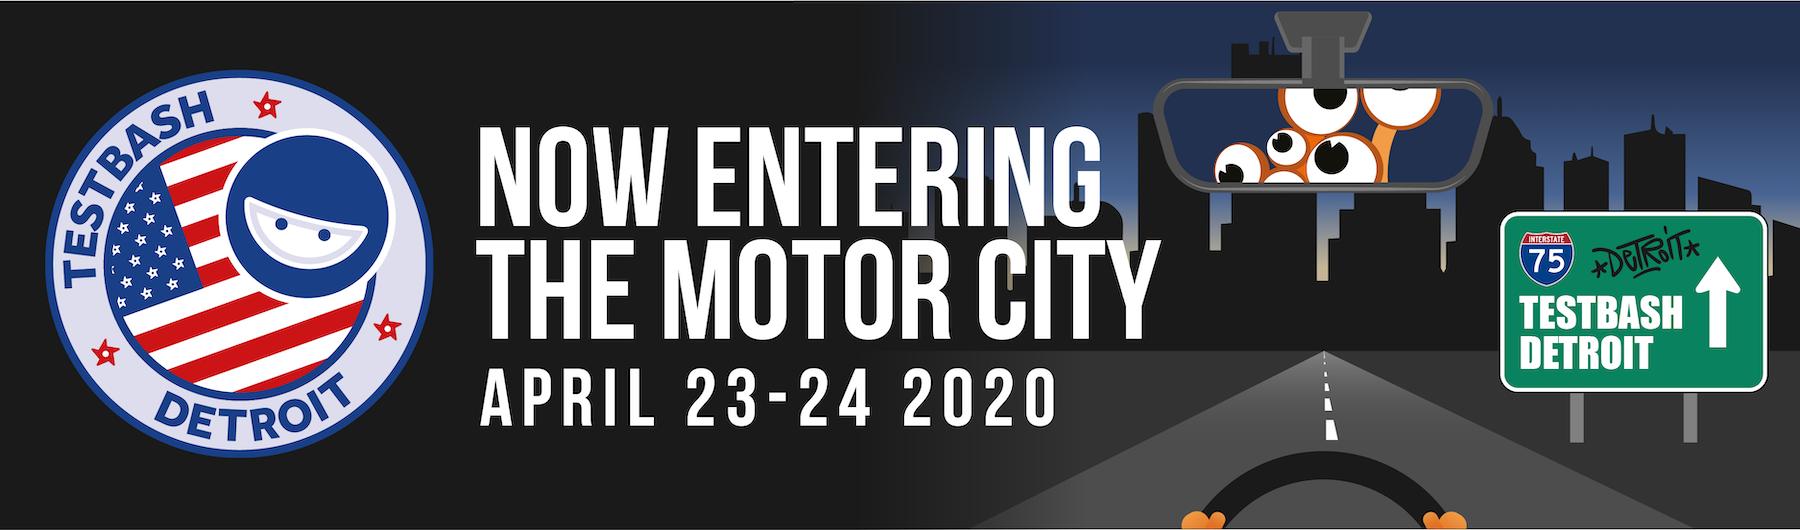 TestBash Detroit 2020